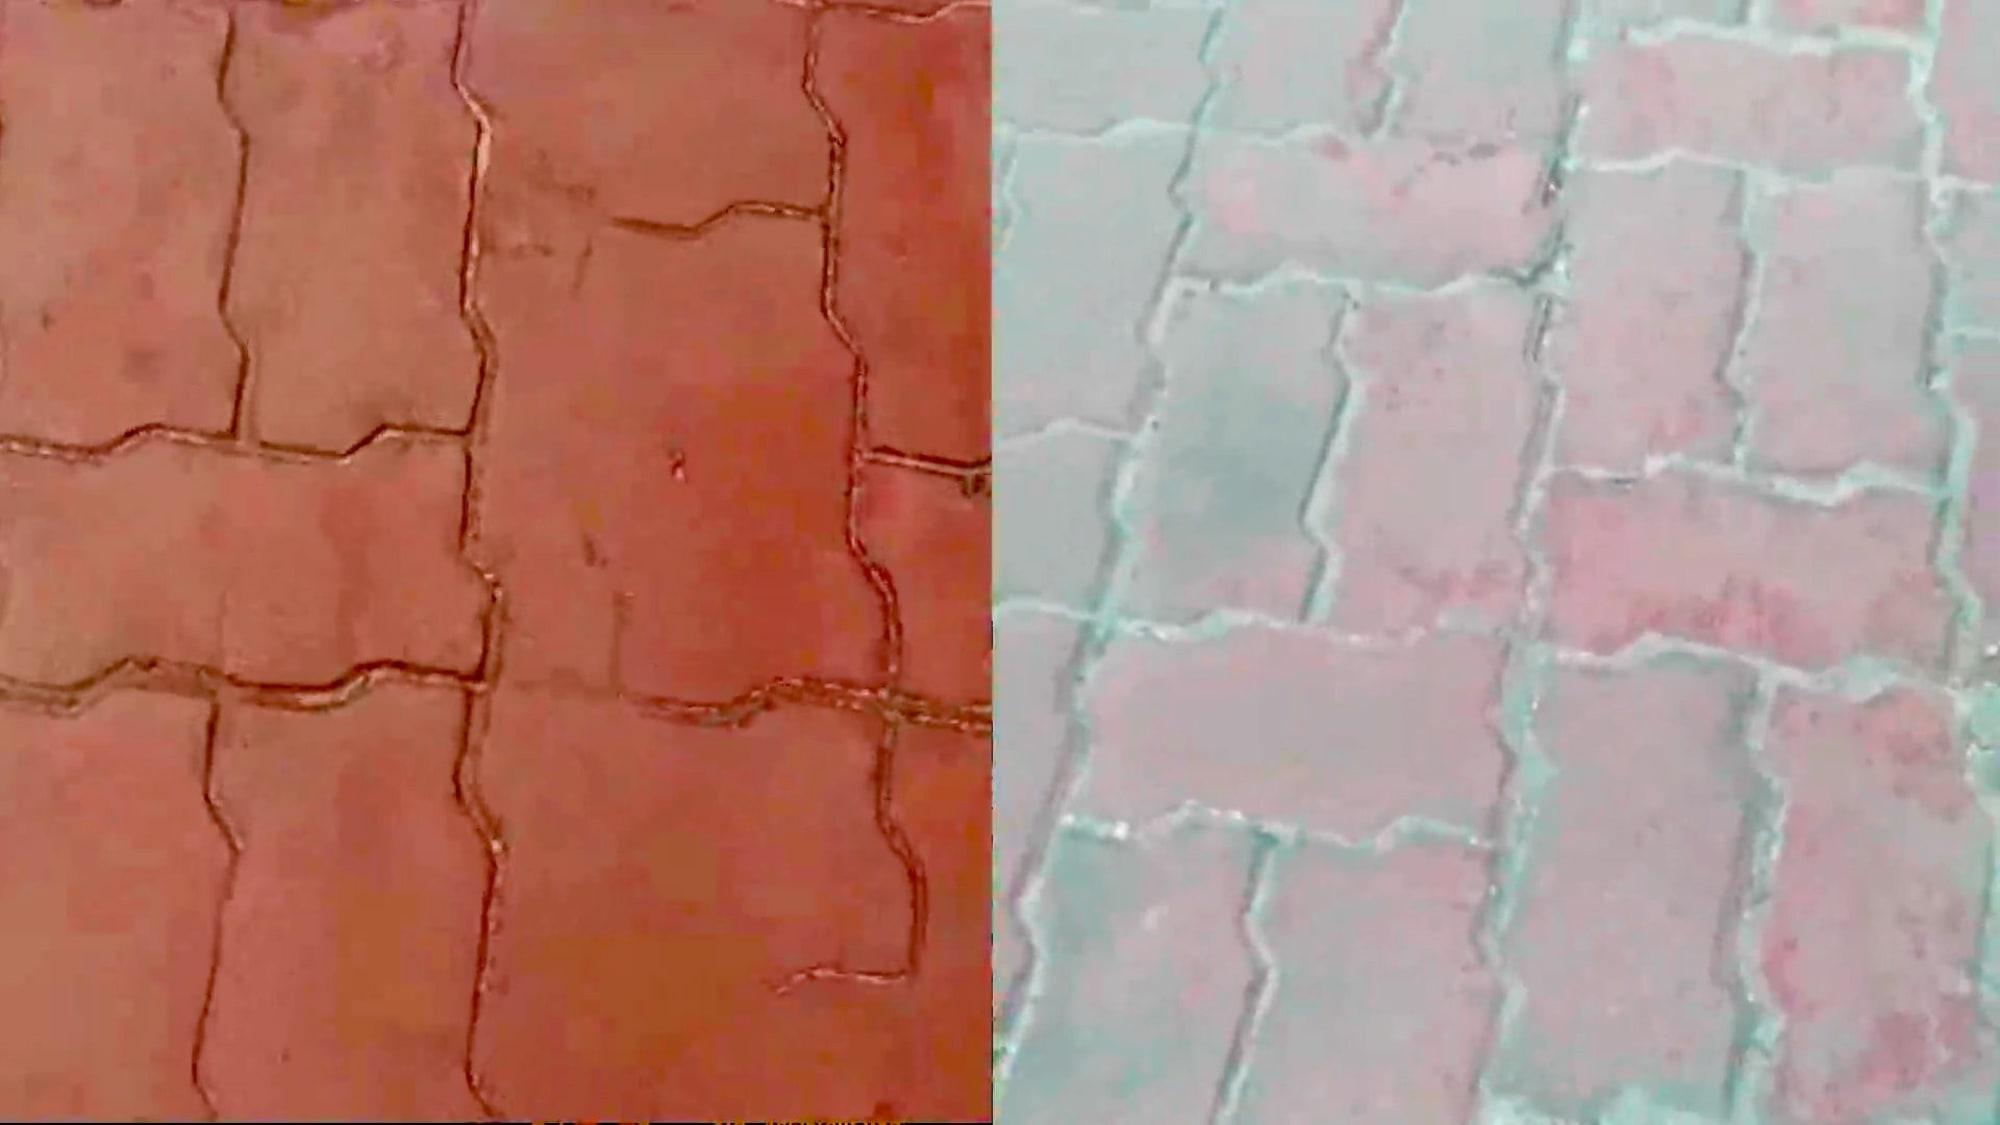 Cut corners in Boracay Sidewalks?